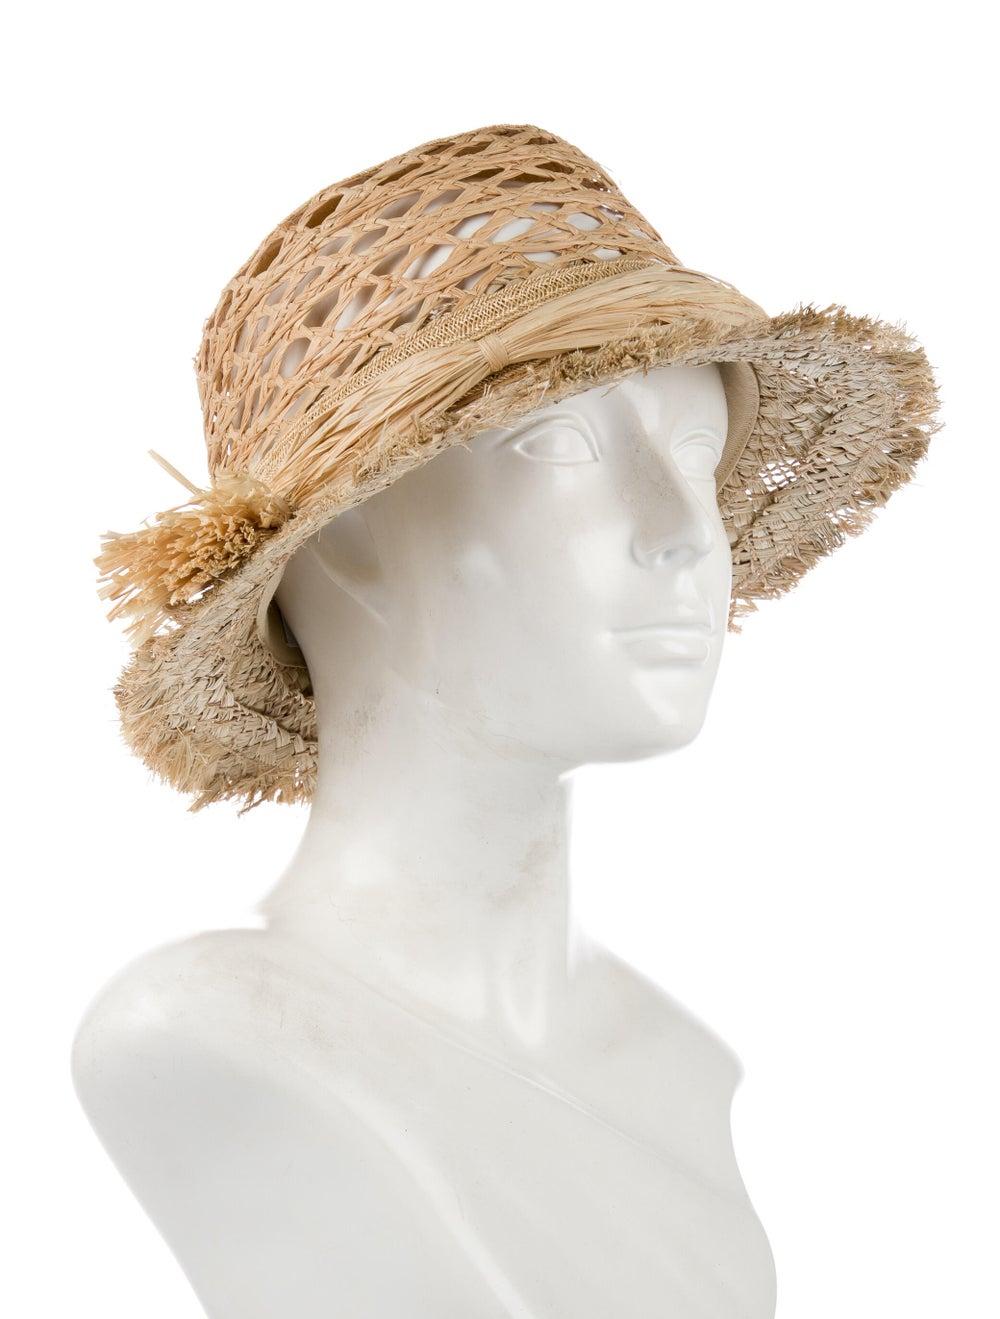 Christian Dior Jardin Raffia Hat Tan - image 3